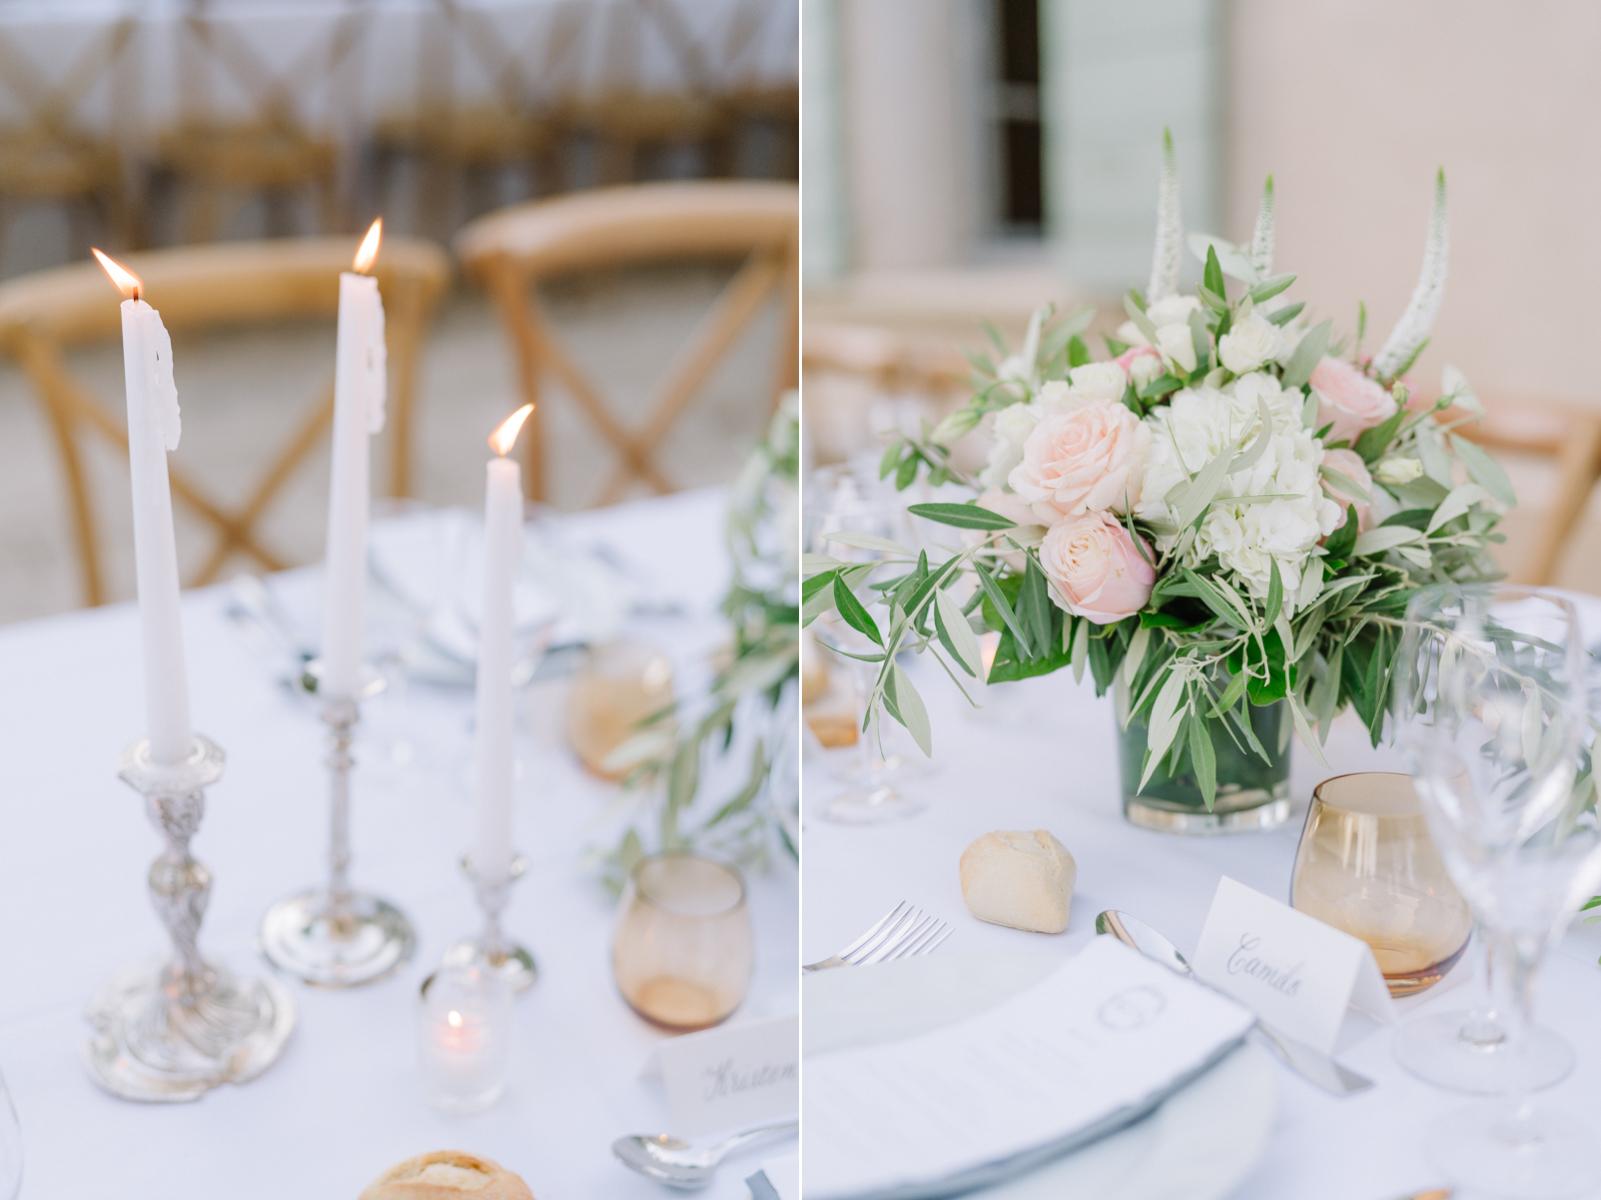 Boheme-Moon-Photography-Wedding-in-Provence-France_027.jpg